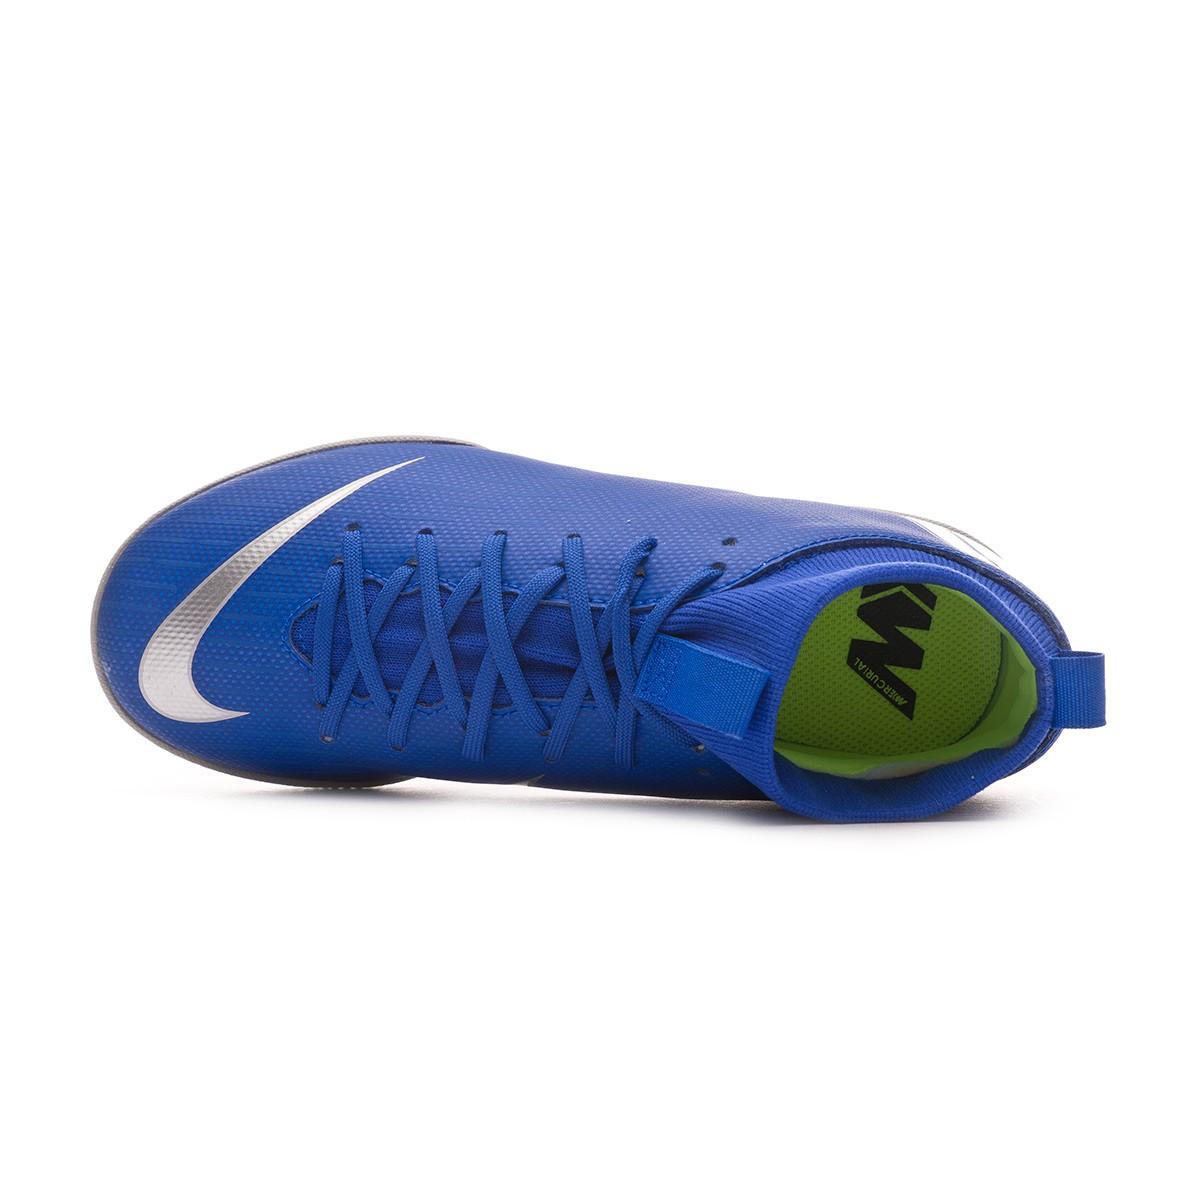 0dc319ec734b Futsal Boot Nike Kids Mercurial SuperflyX VI Academy IC Racer blue-Metallic  silver-Black-Volt - Football store Fútbol Emotion